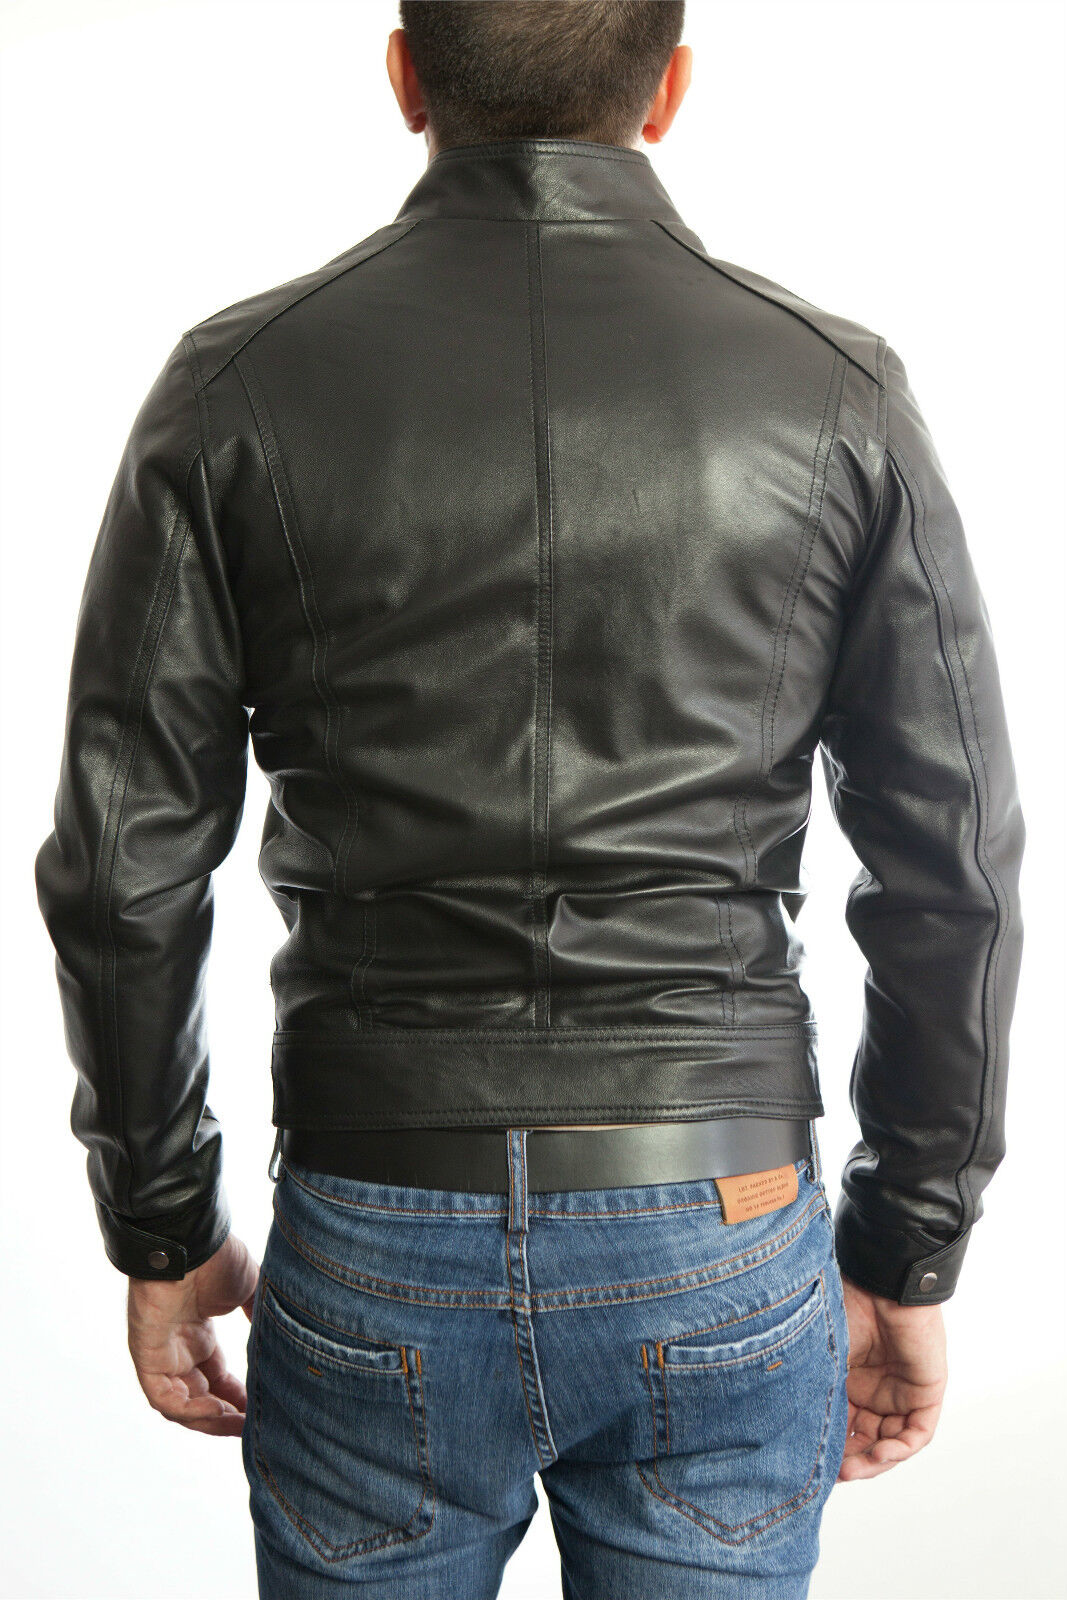 efc1803fc1 DE Herren kabát Lederjacke En Biker férfi bőr 100 nadrág kabát Homme Veste  En cuir 3s5a